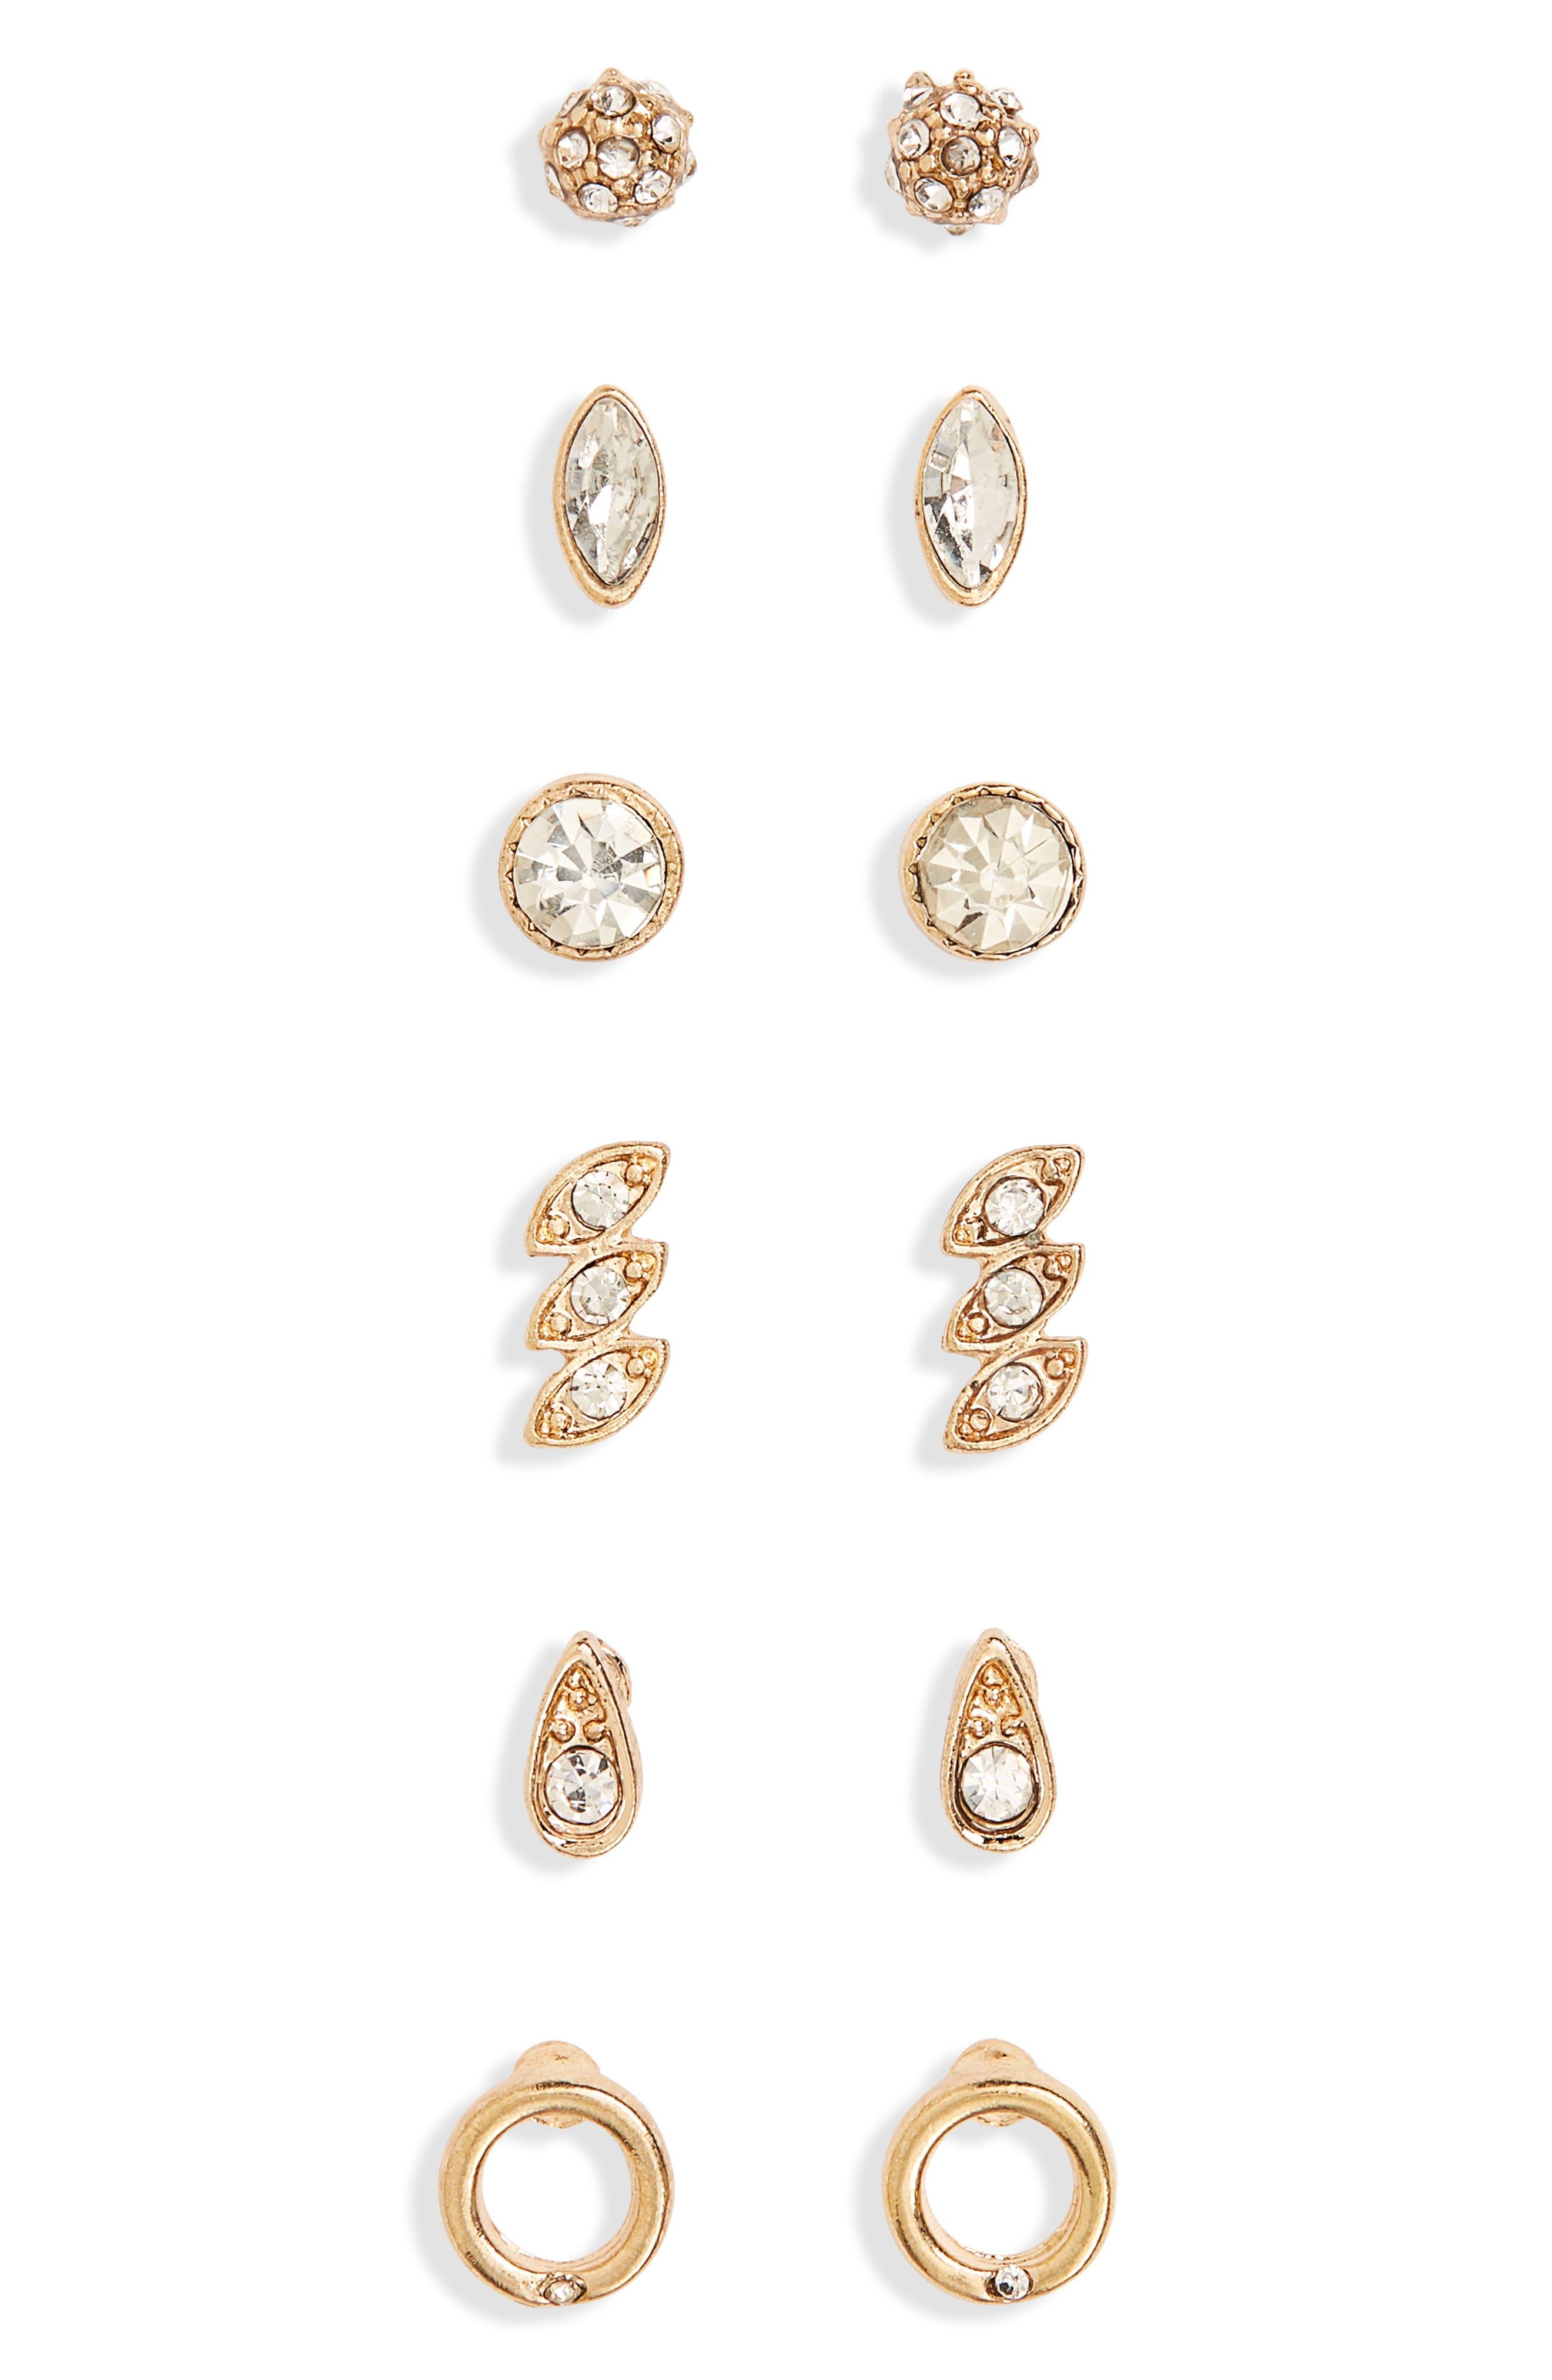 6-Pack Crystal Stud Earrings,                             Main thumbnail 1, color,                             710